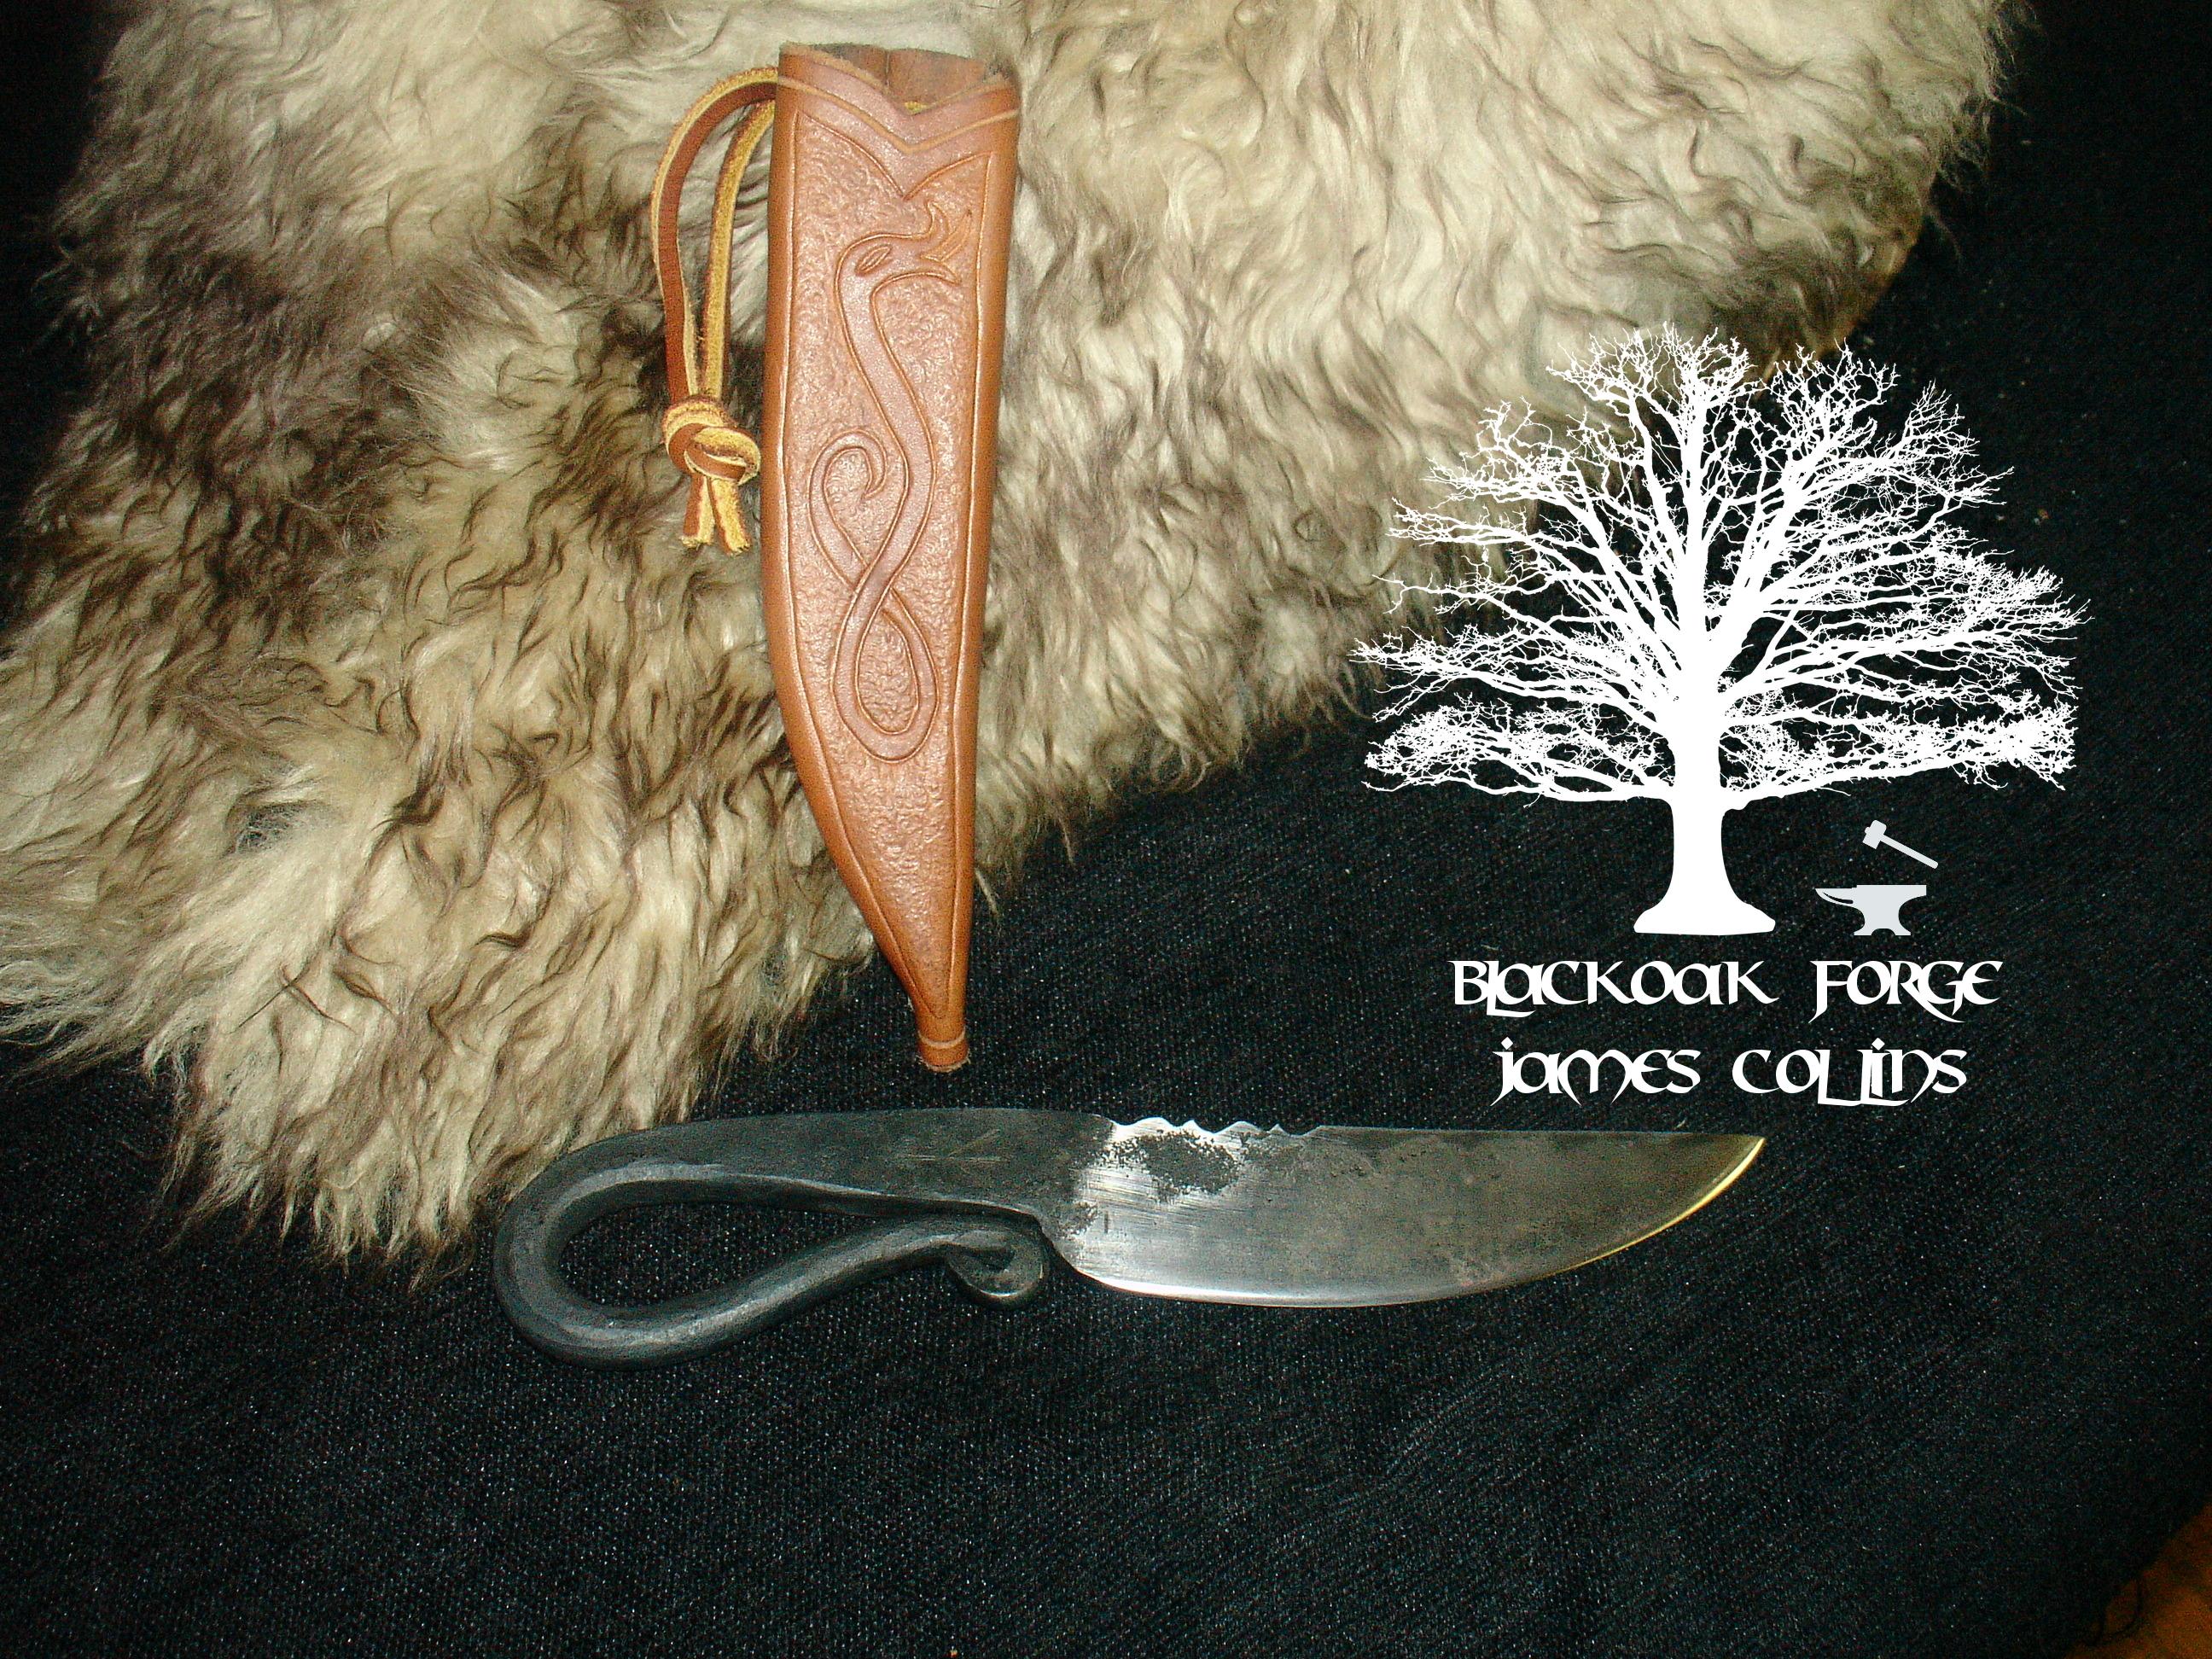 Flint Striker Knife by James Collins Blackoak Forge (4)